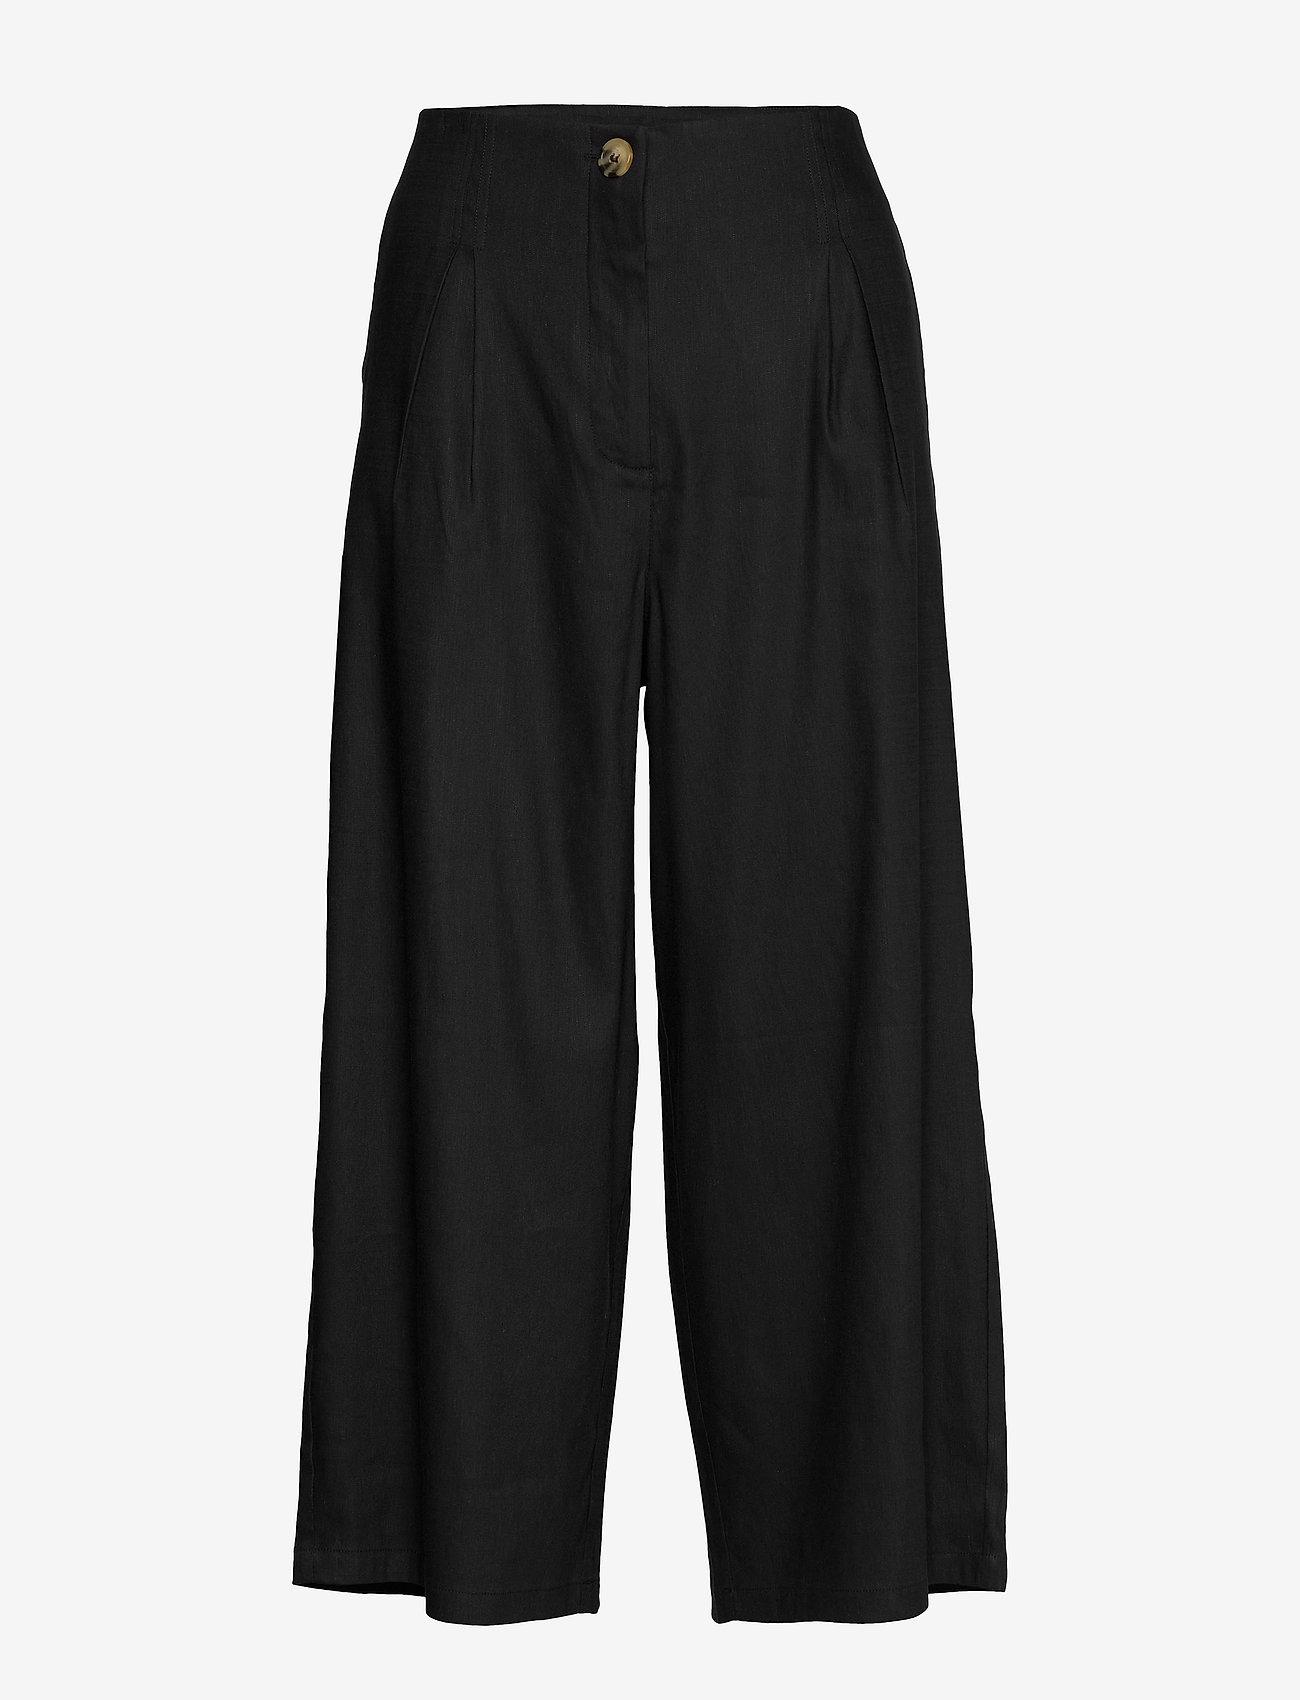 Masai - Paola - spodnie szerokie - black - 0